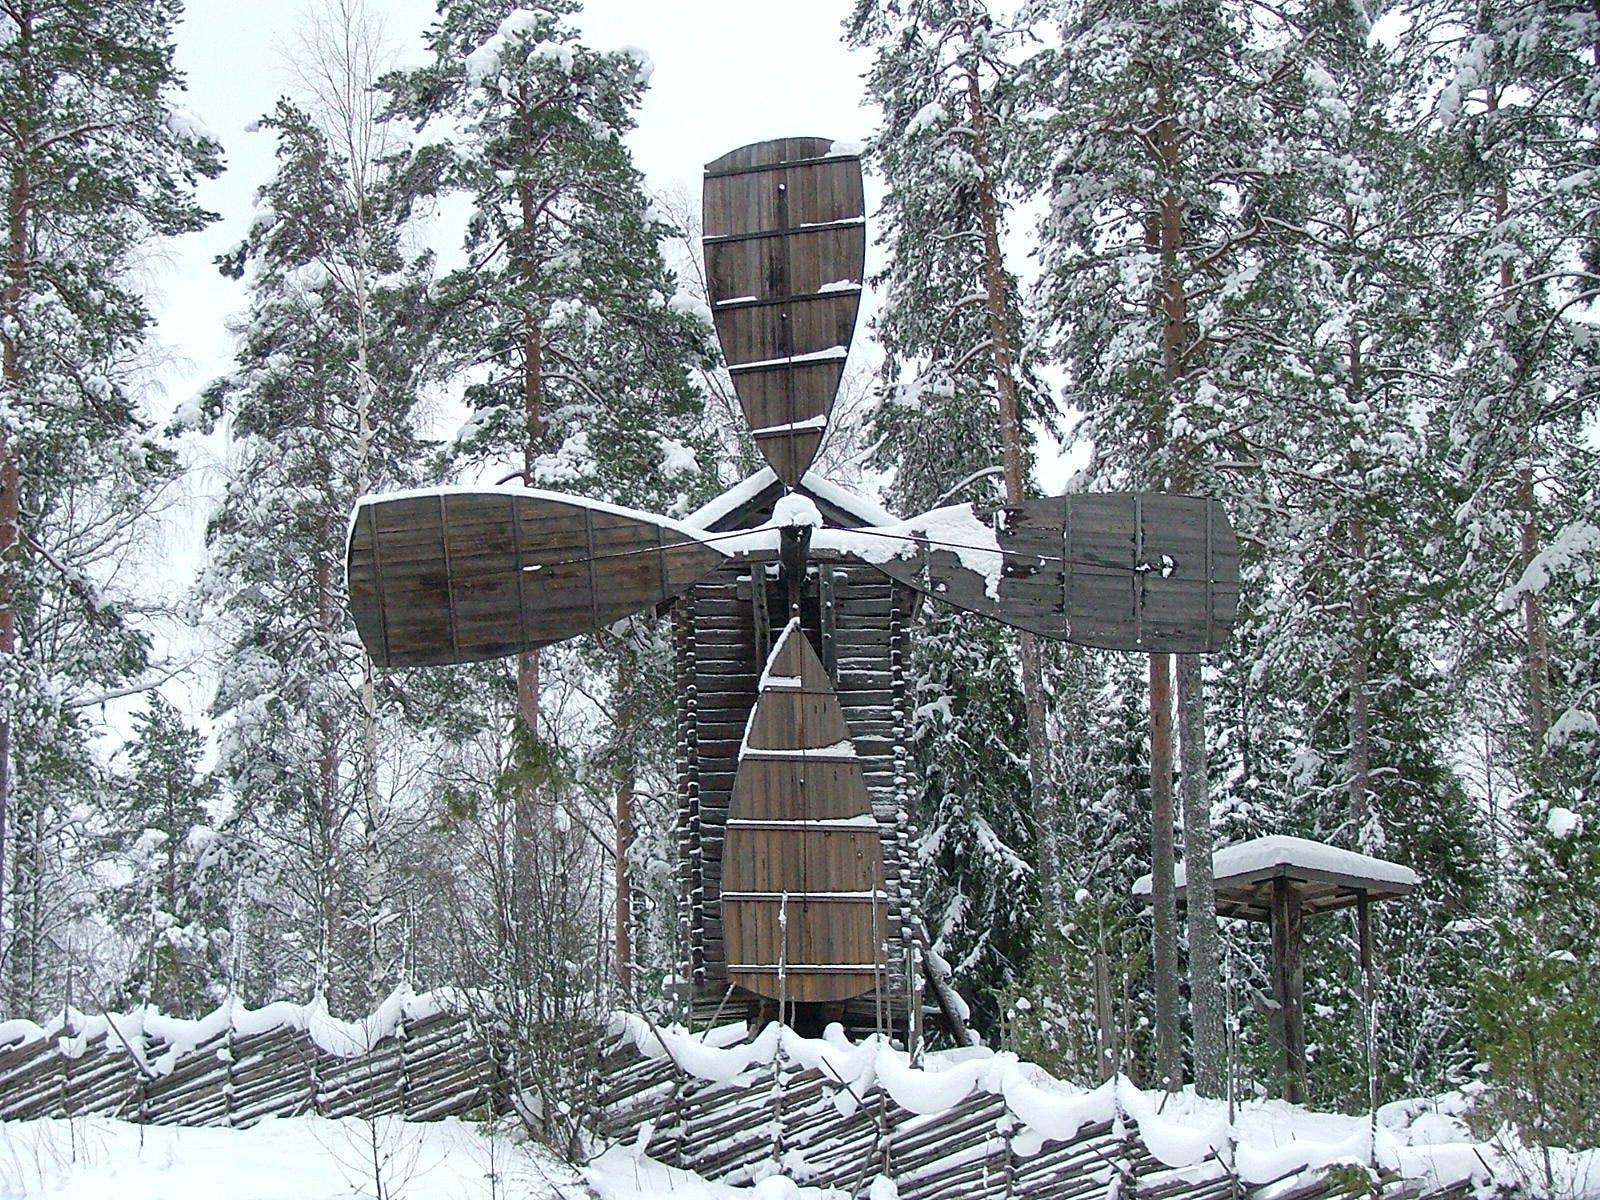 Finlandia - Hagámoslo Al Tiro - Emisor Podcasting